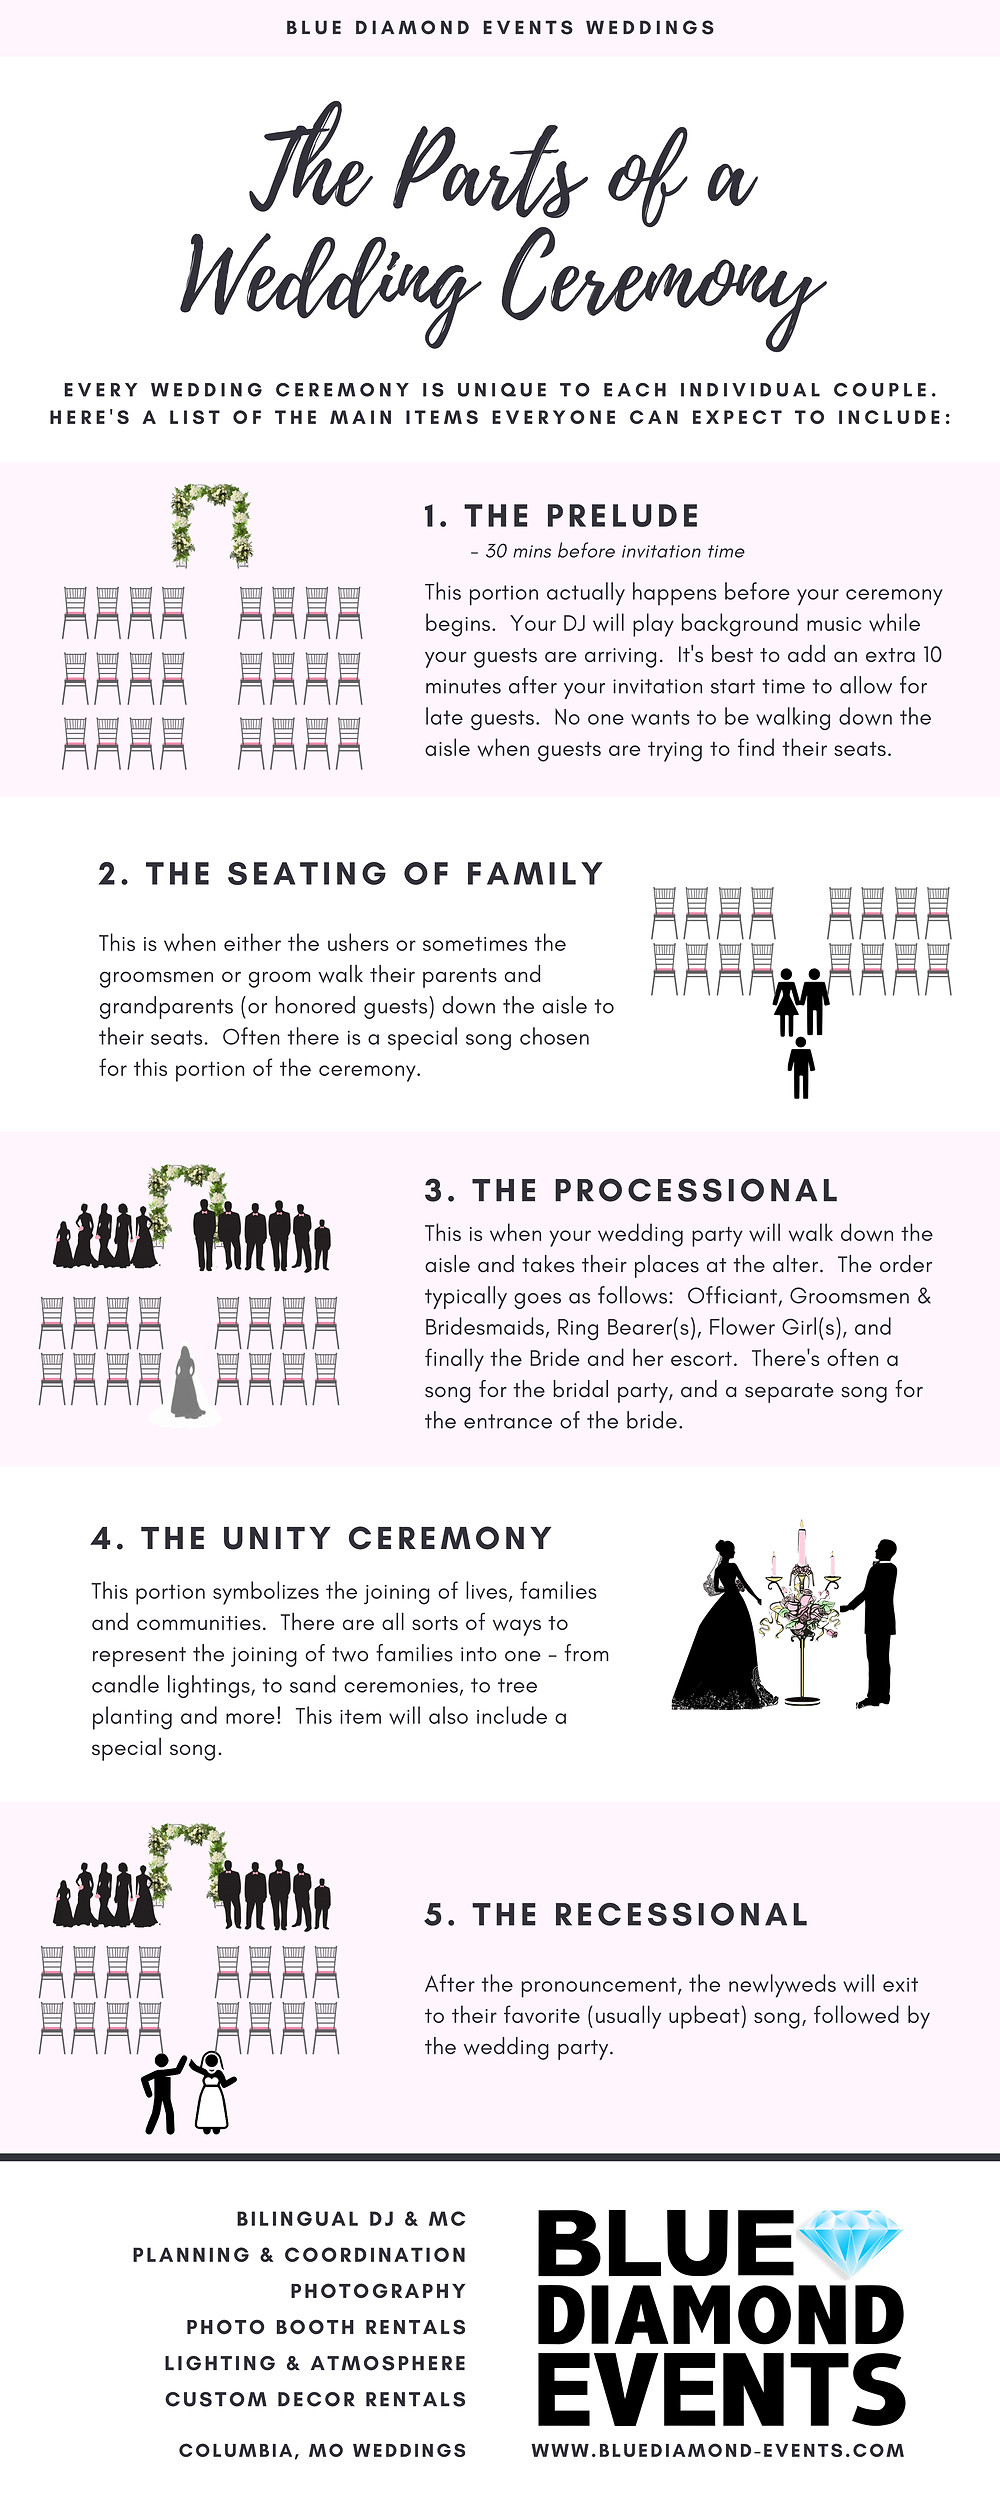 Wedding, Ceremony, parts, blue diamond events, columbia, mo, weddings, dj, planning, planner, coordinator, coordinating, help, tips